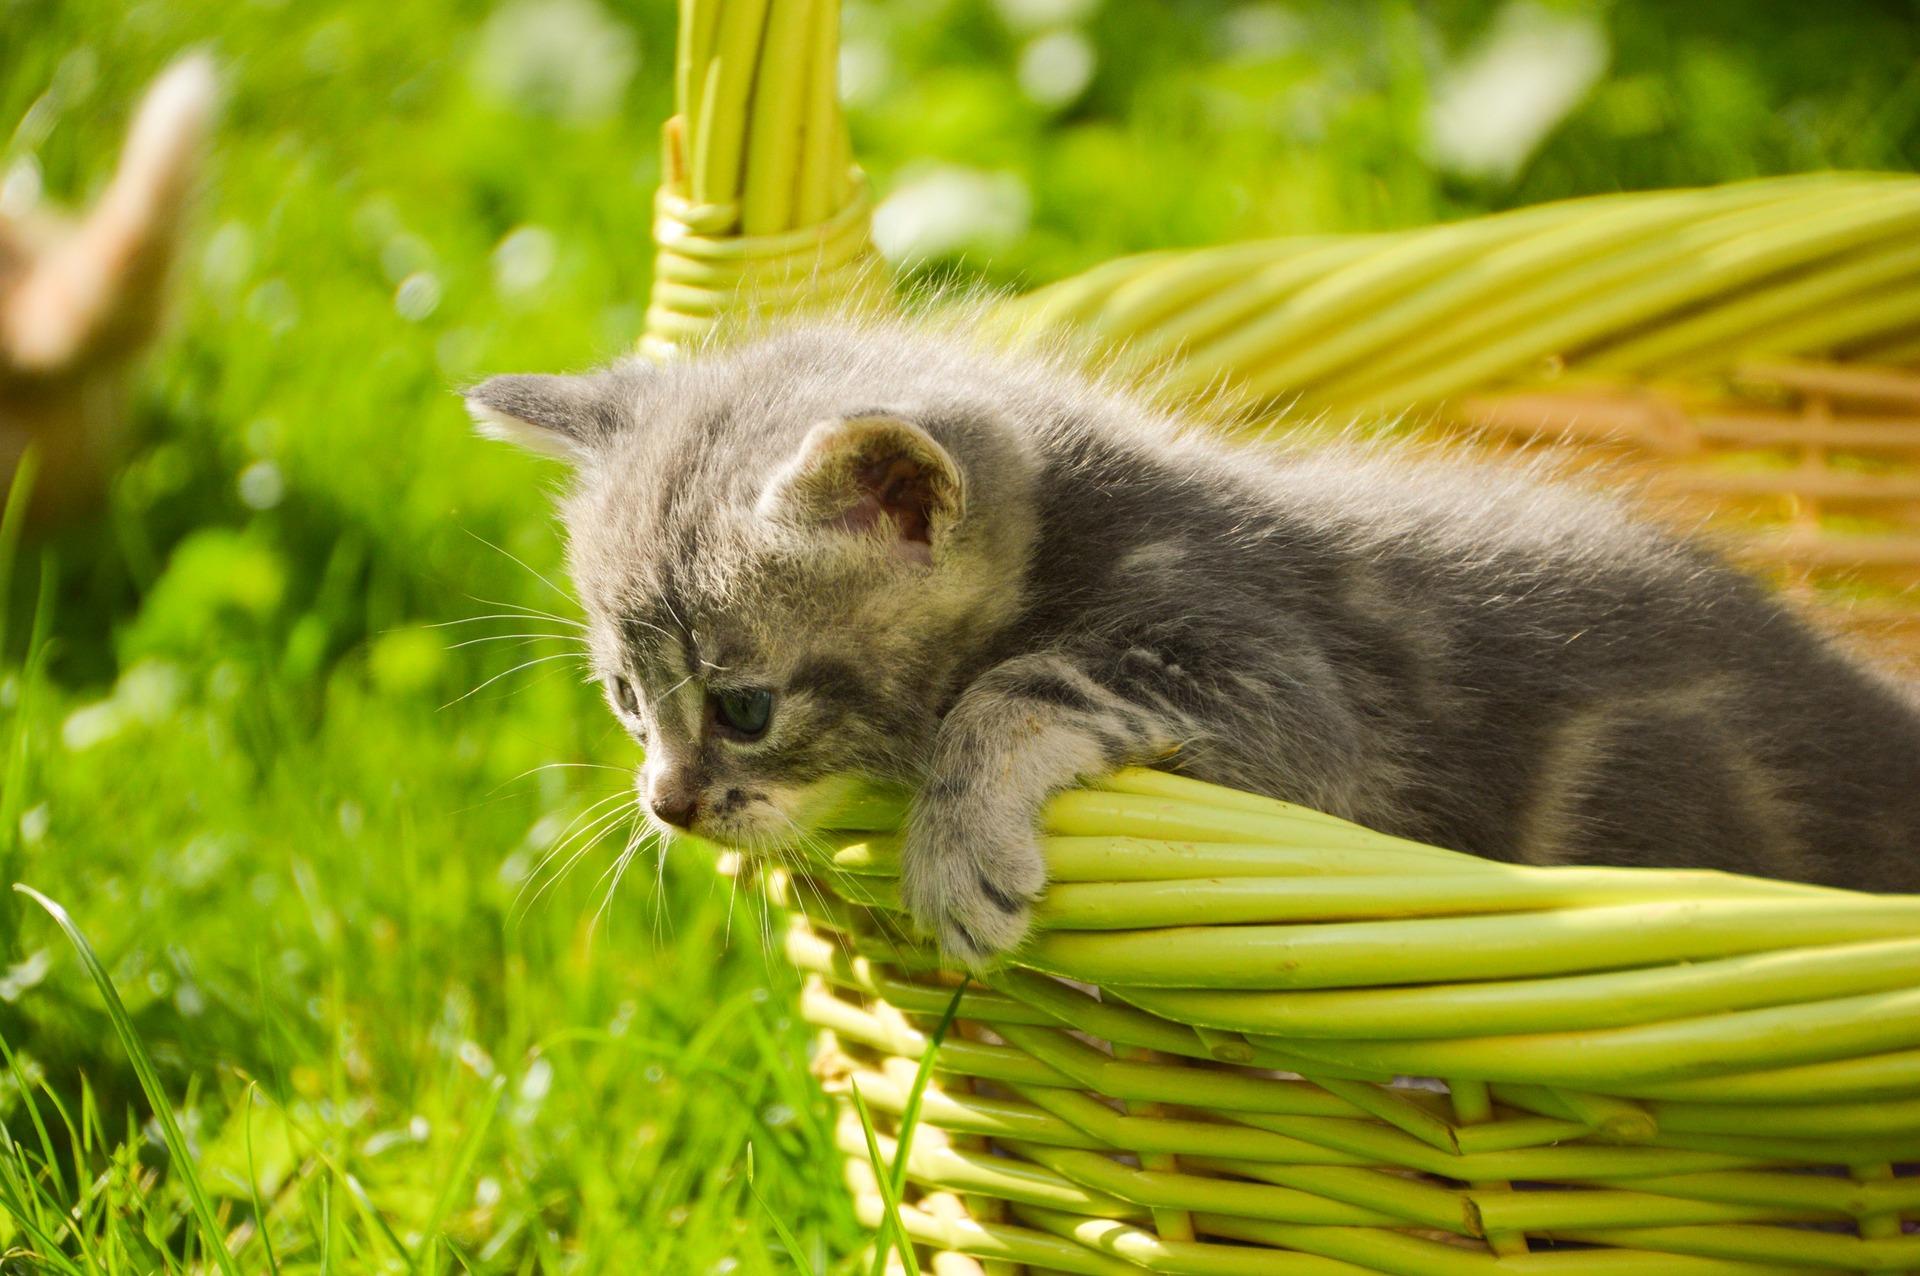 szkolenie kota